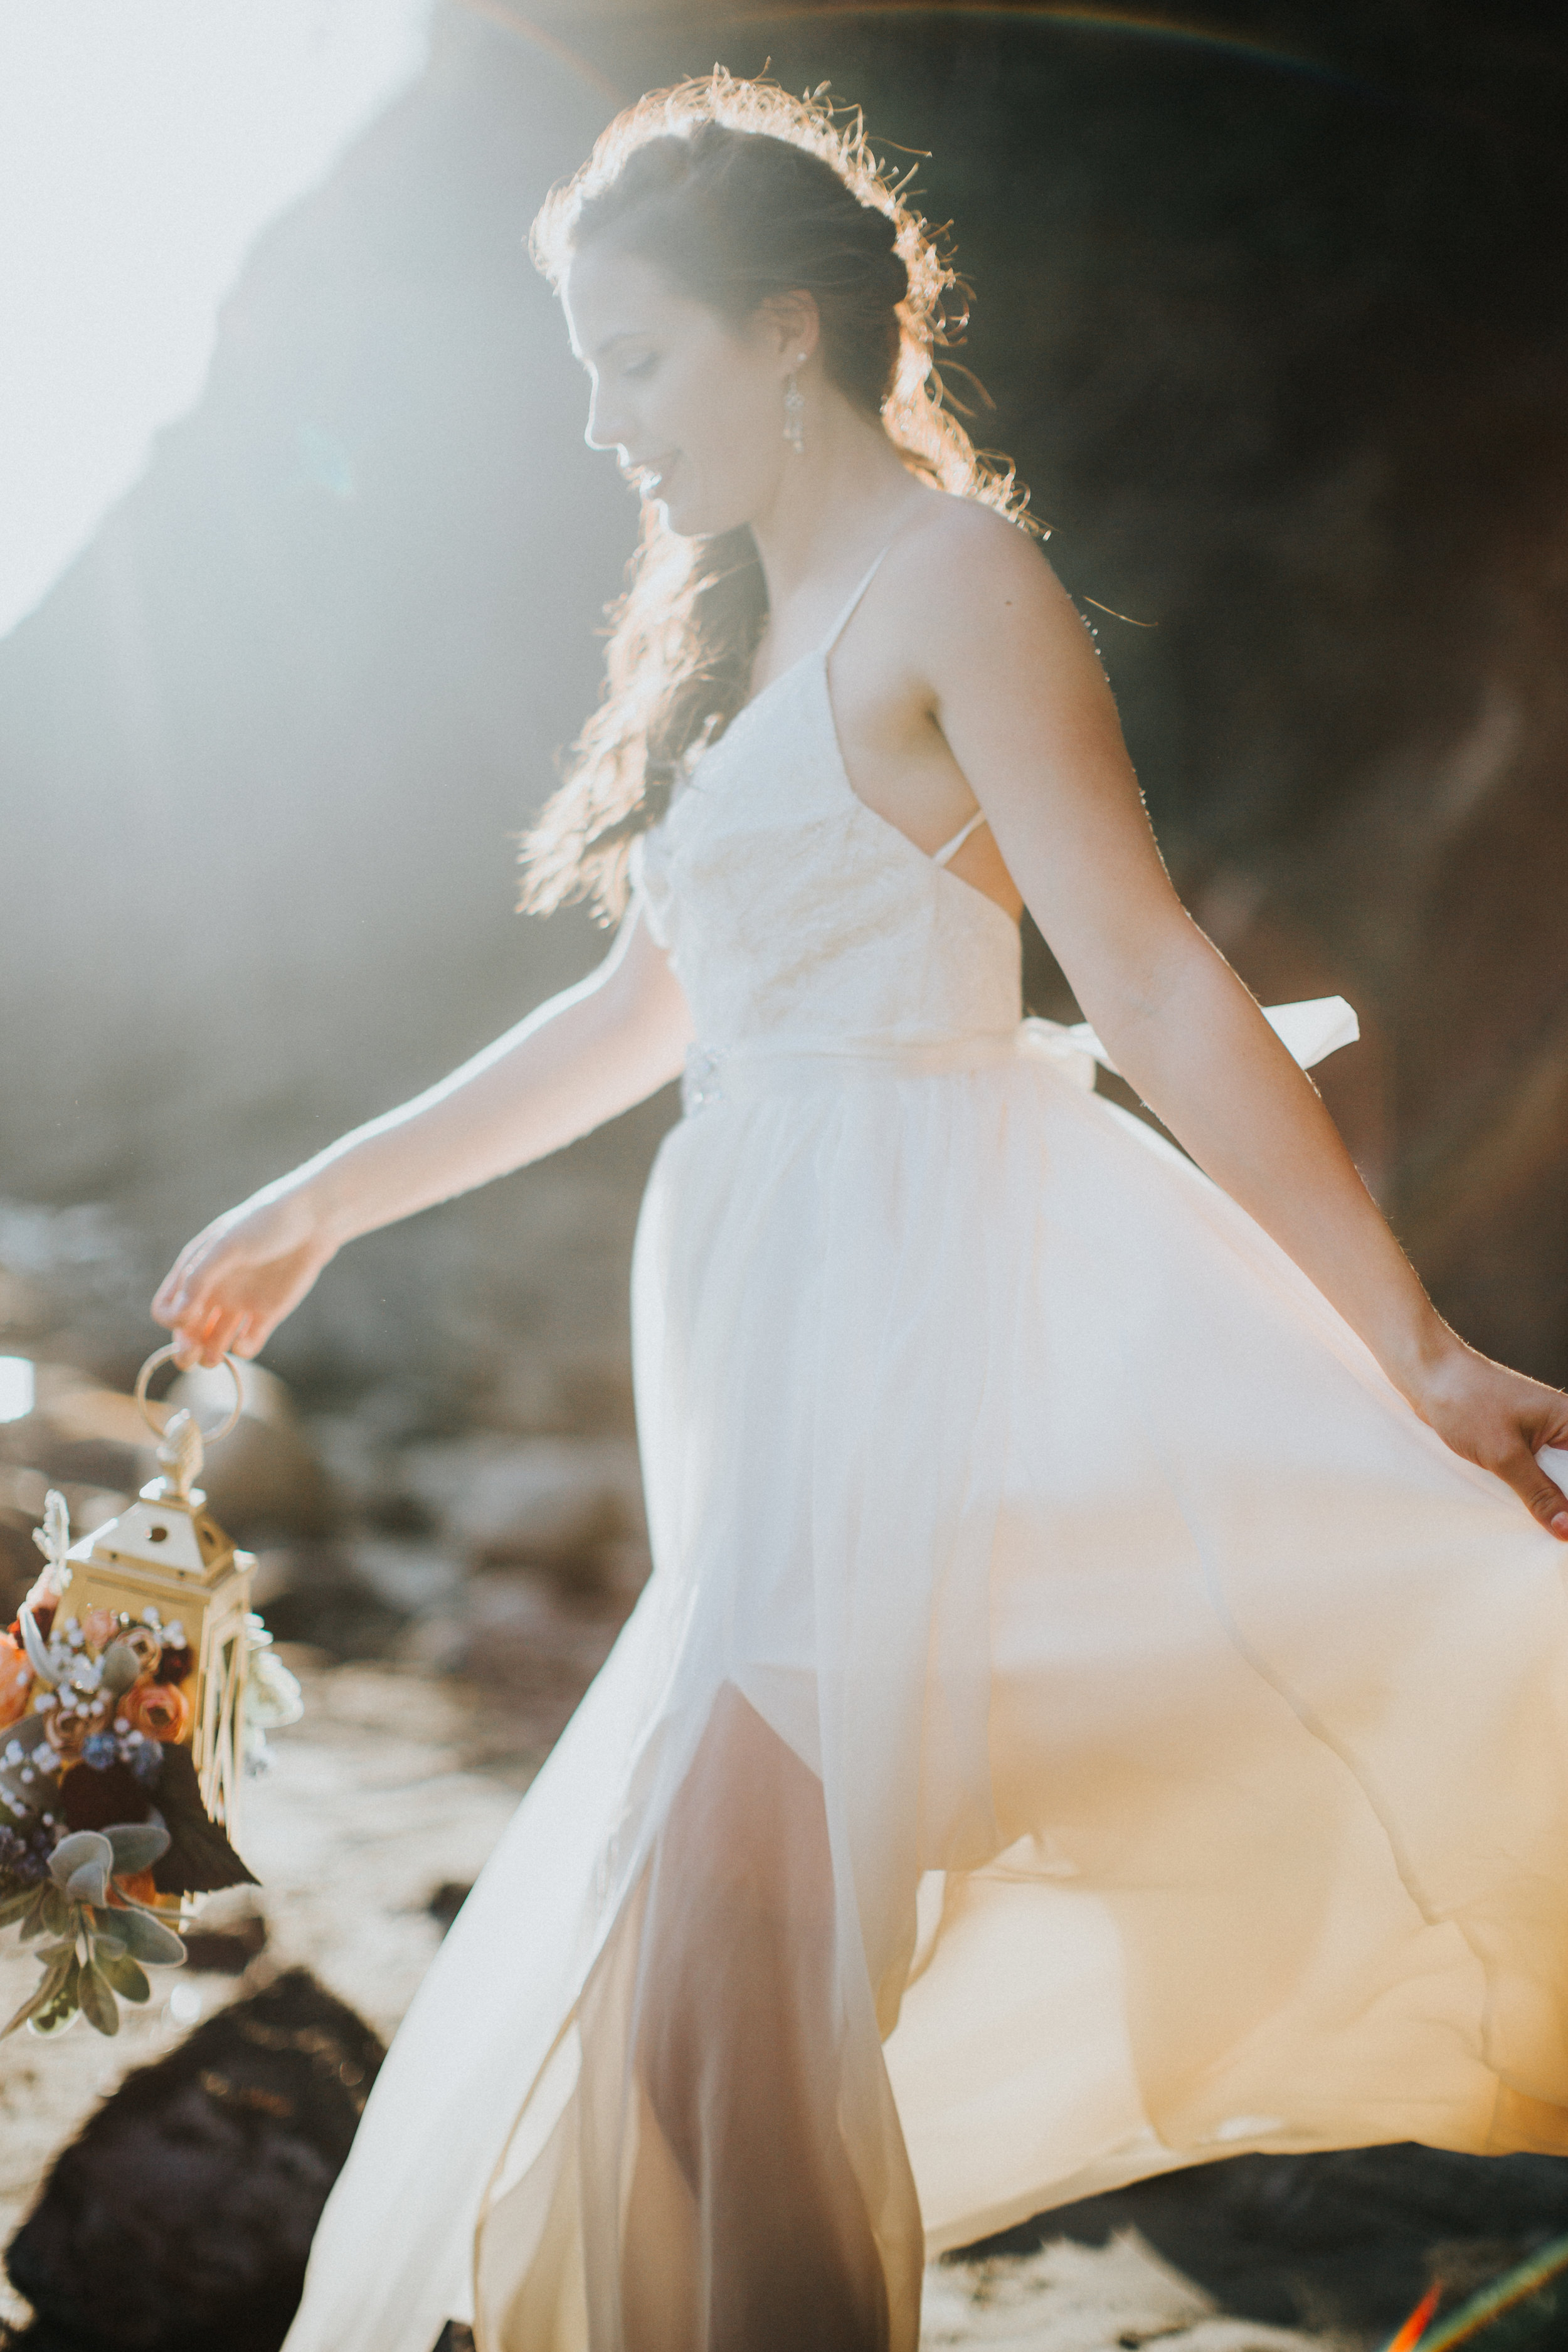 Port-Angeles-Salt-Creek-beach-wedding-bride-PNW-olympic-peninsula-photographer-Kayla-Dawn-Photography-outdoors-golden-hour-dancer-dress (15).jpg